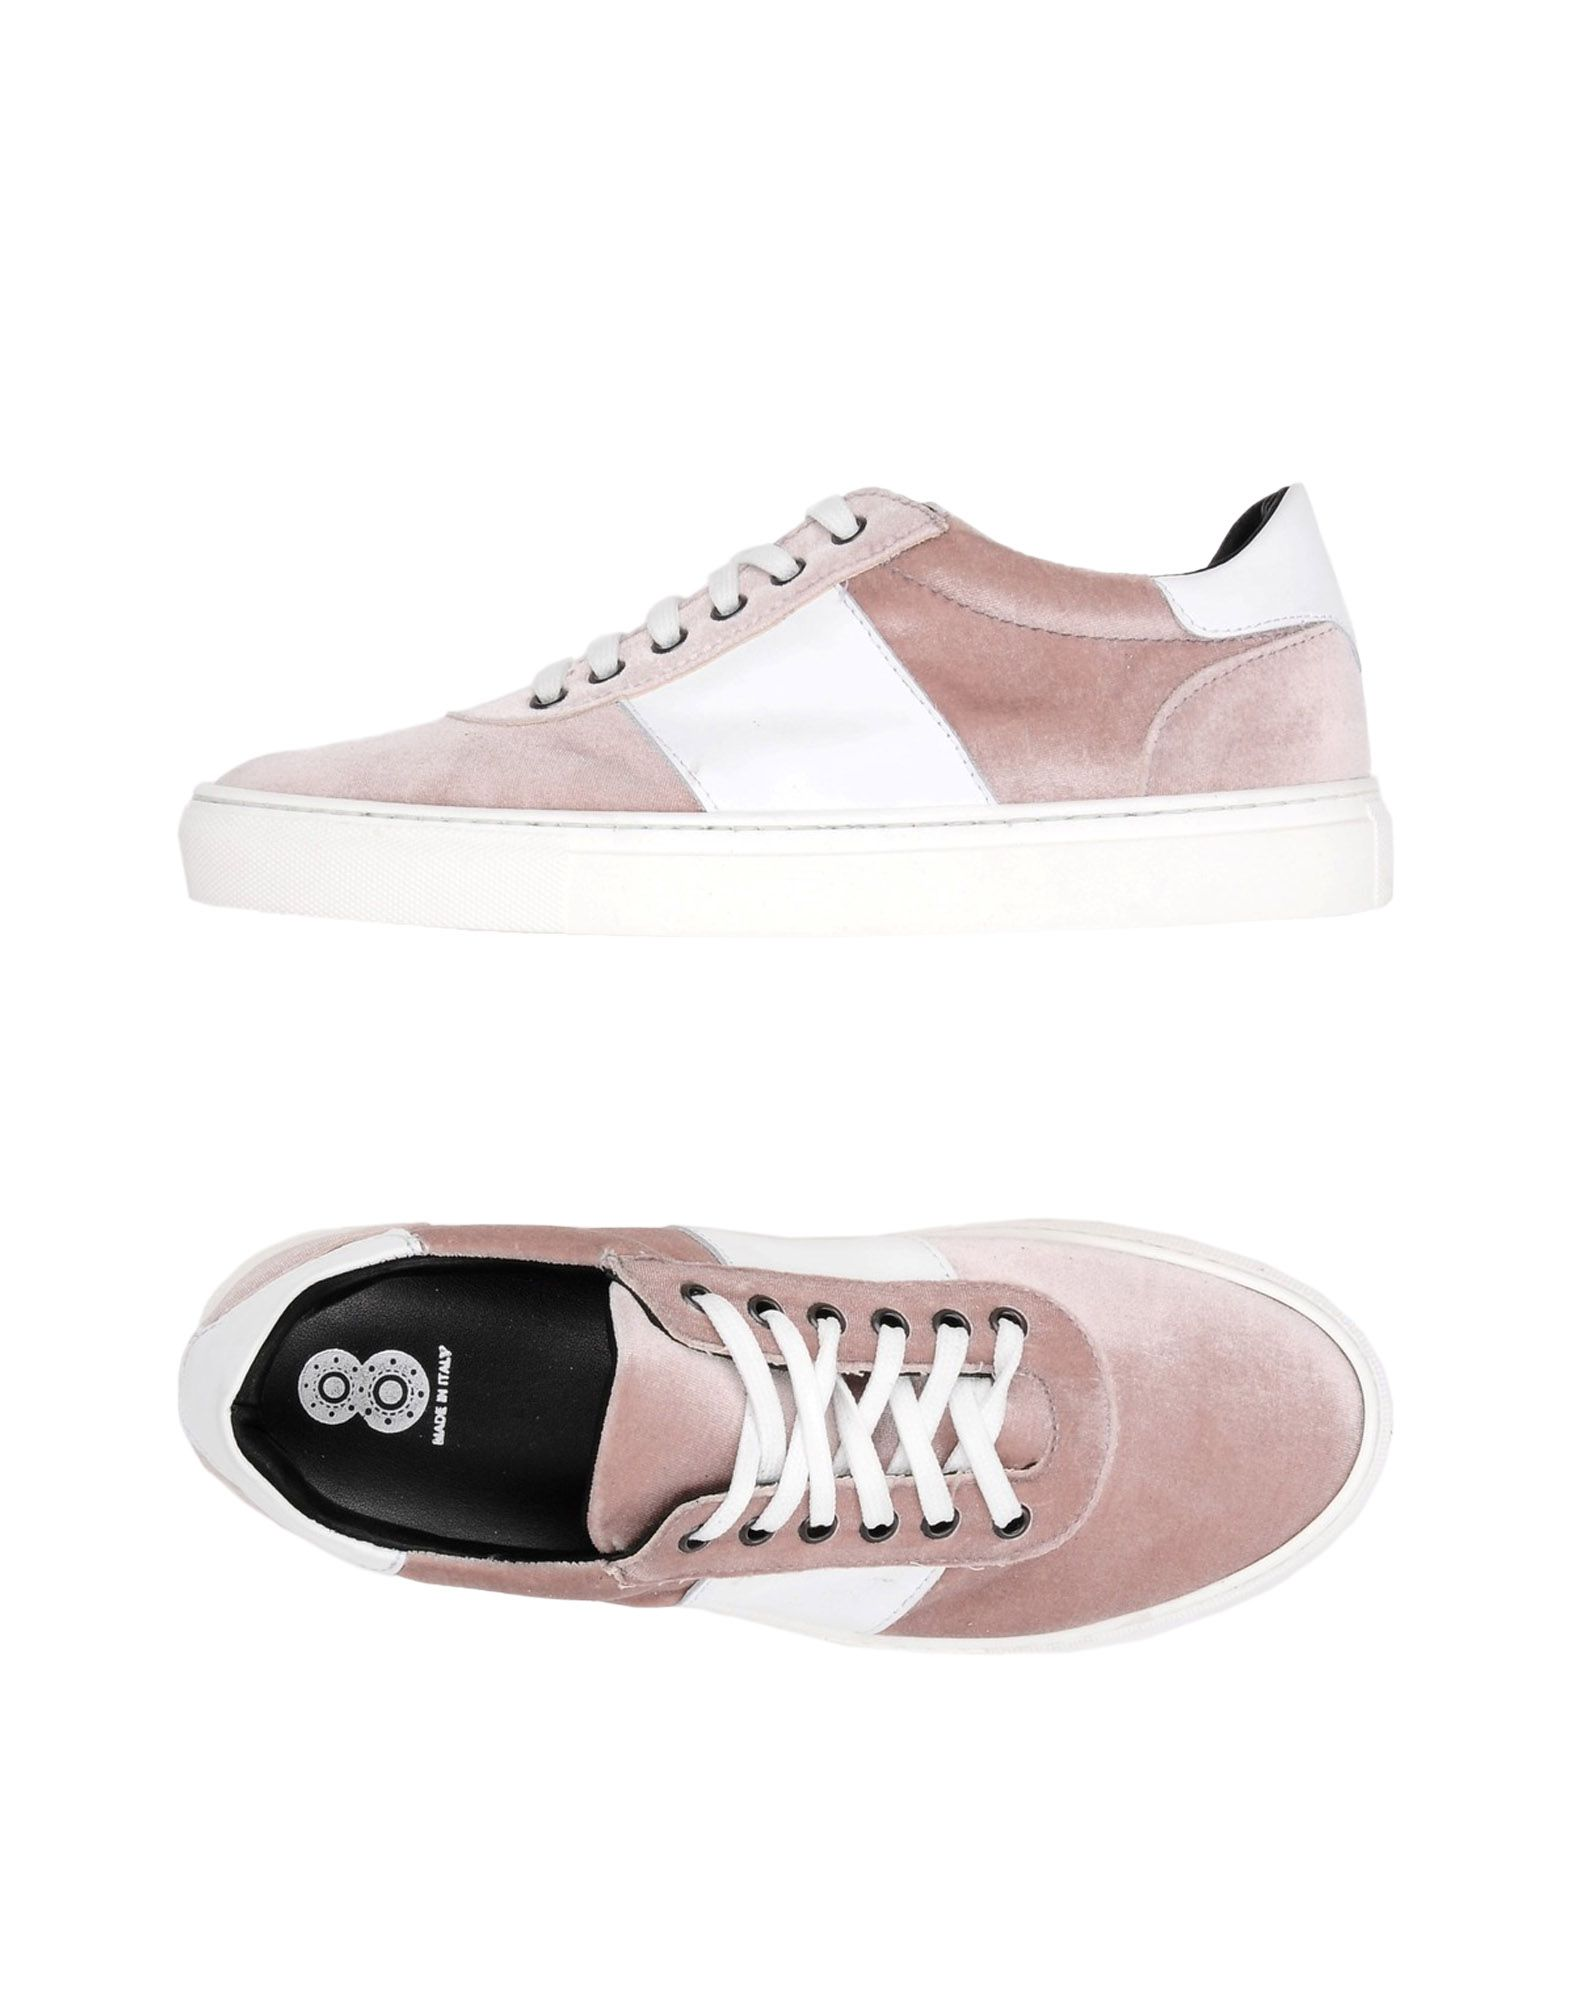 Moda Sneakers 8 Donna - 11393009GH